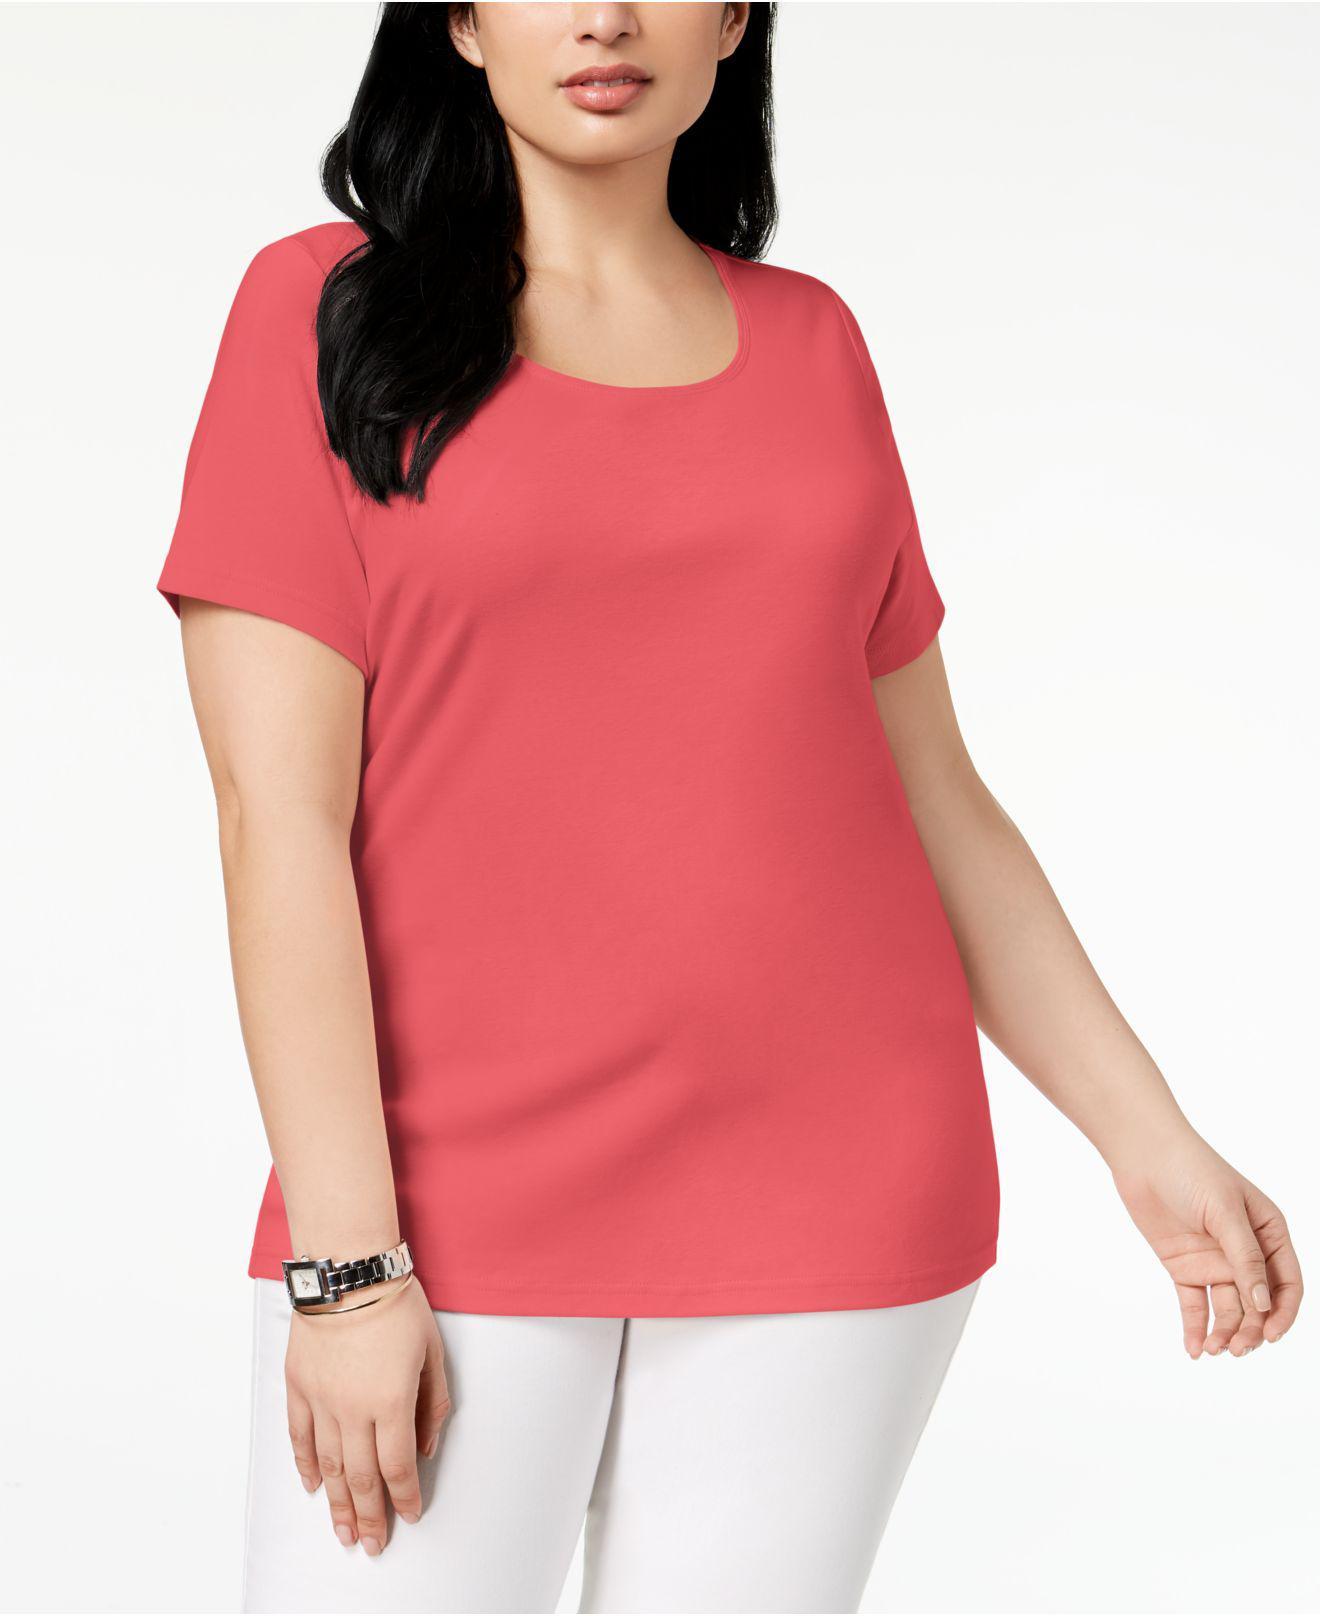 038fb967ac034 Lyst - Karen Scott Plus Size Cotton Scoop-neck T-shirt